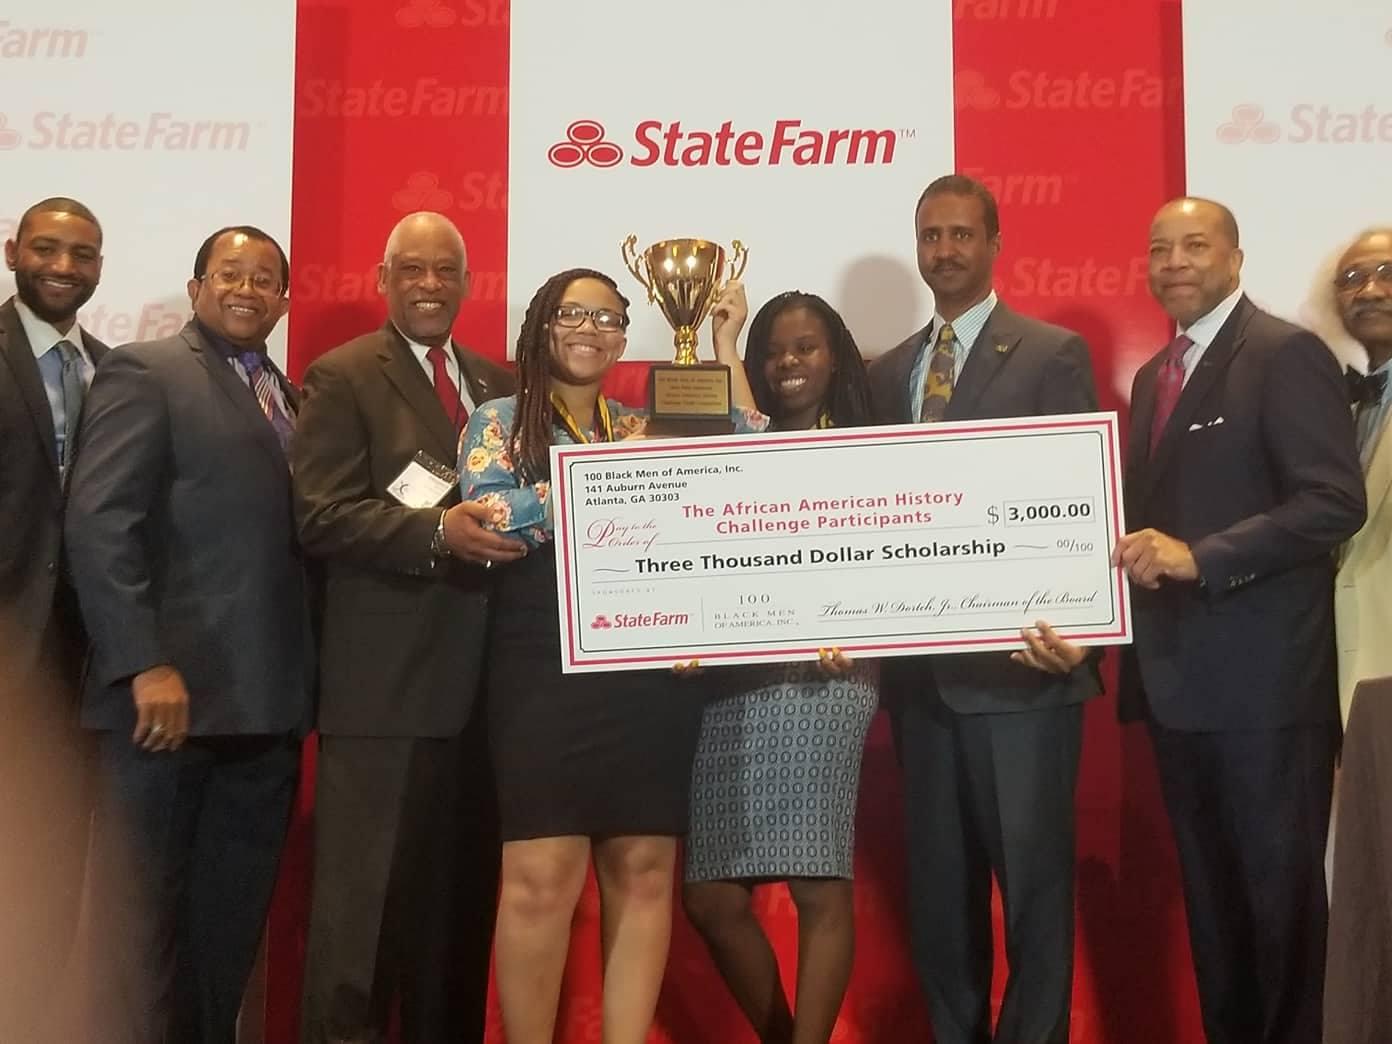 Philadelphia Chapter Team 2018 African American History Challenge National Winners